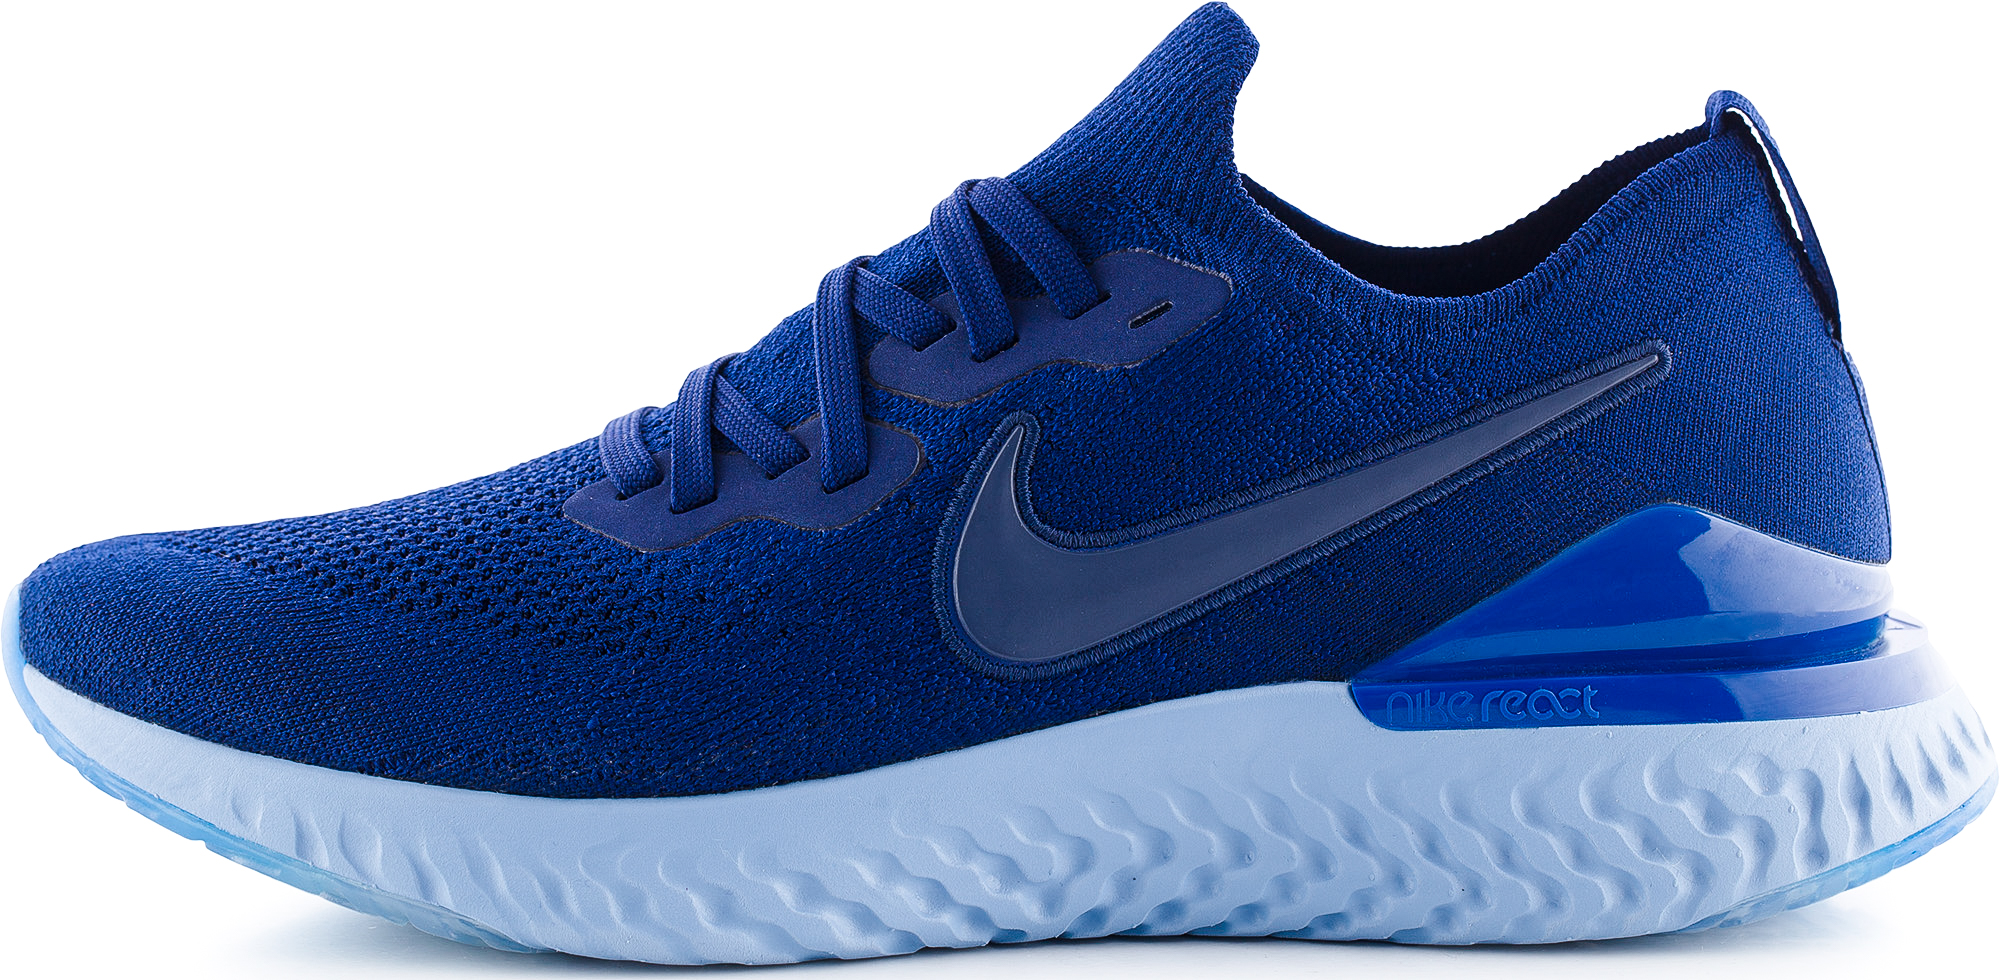 Nike Кроссовки мужские Nike Epic React Flyknit 2, размер 44 nike боксерки мужские nike machomai размер 44